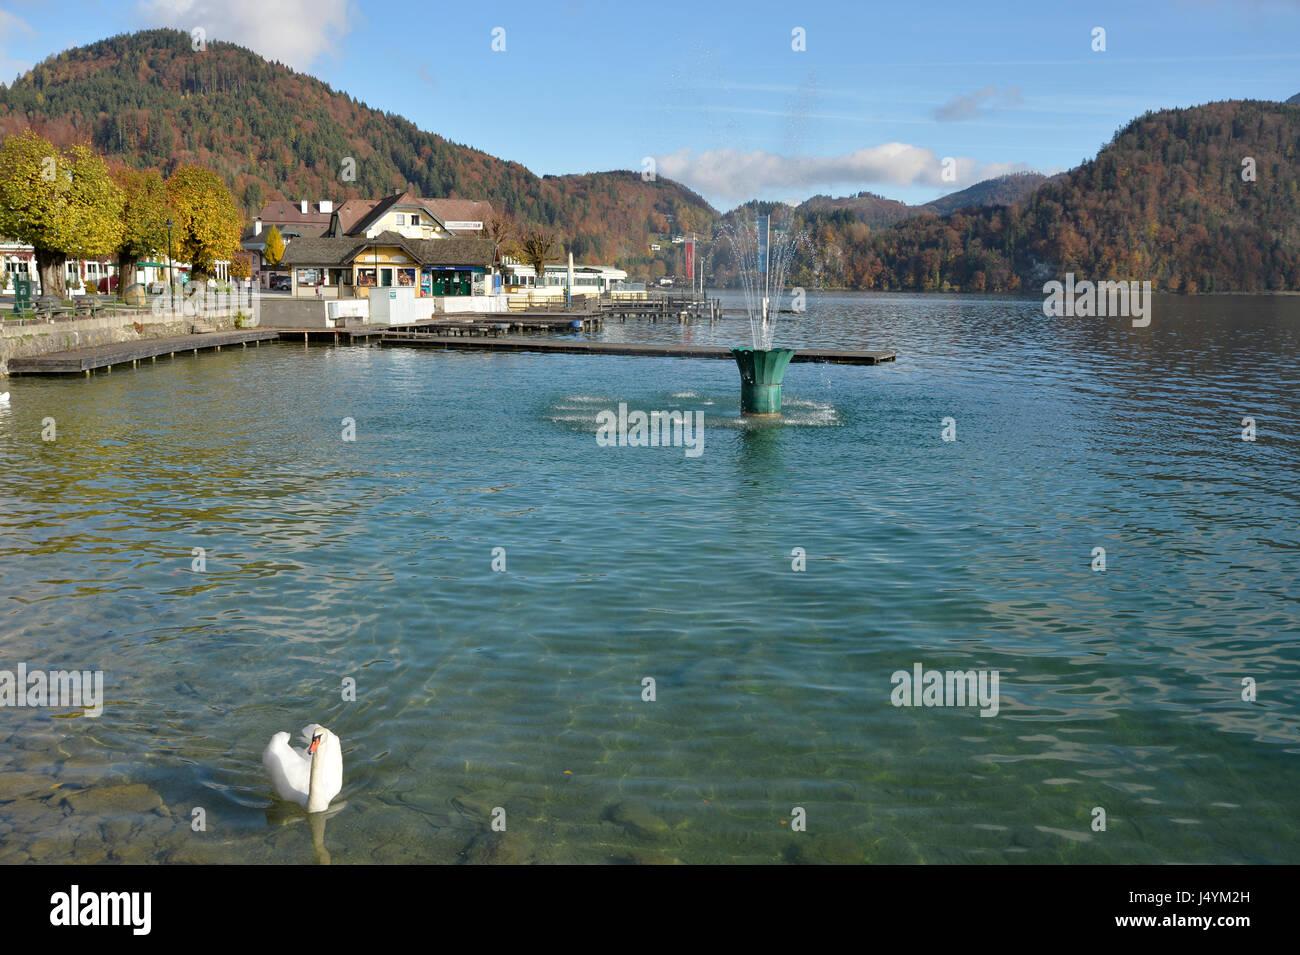 St. Gilgen, Wolfgangsee, Austria - Stock Image